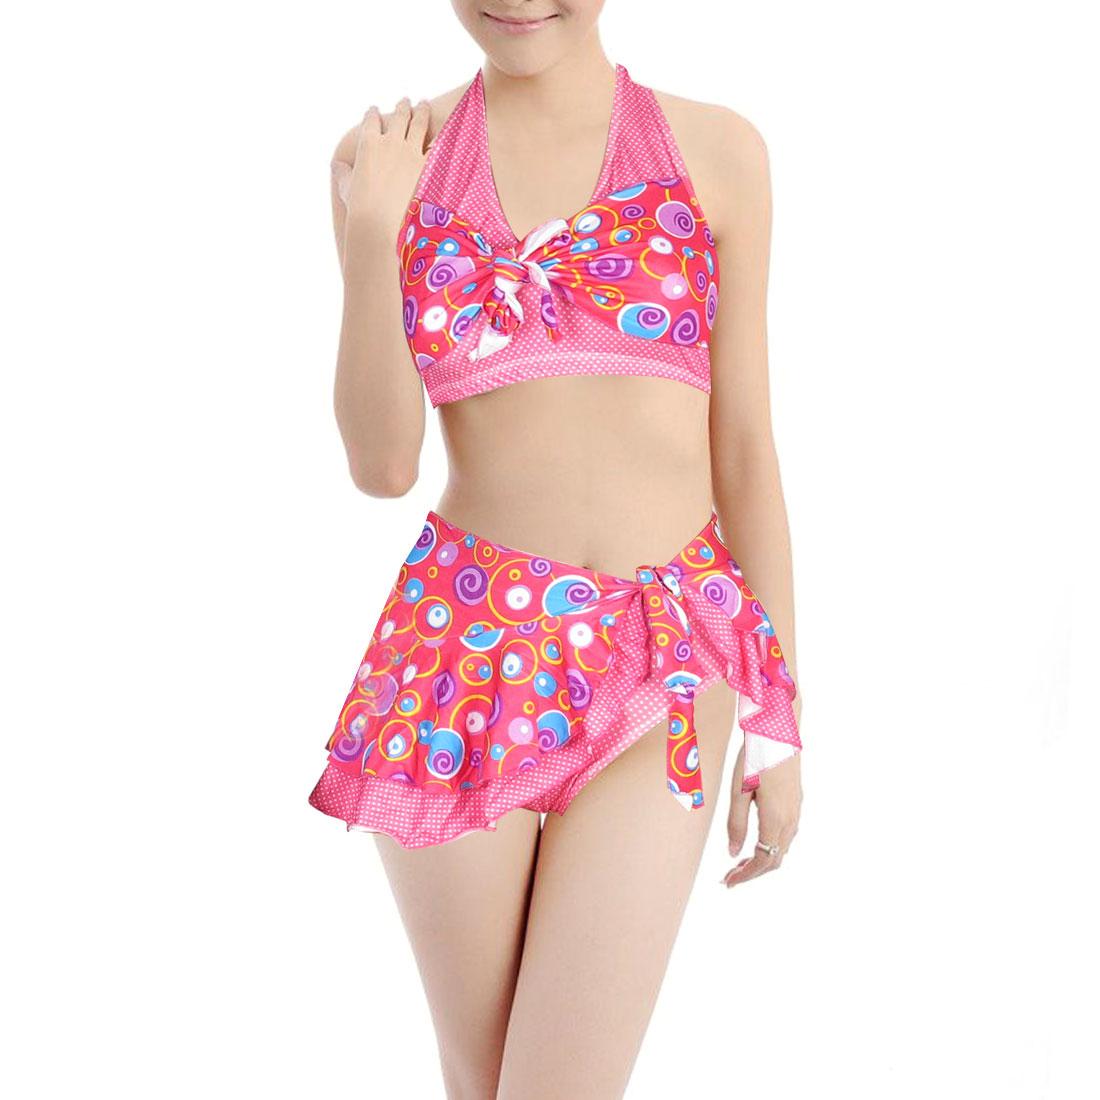 Ladies Three Piece Halter Bra Top Briefs Wrap Skirt Swimsuit Swimwear Fushcia XS